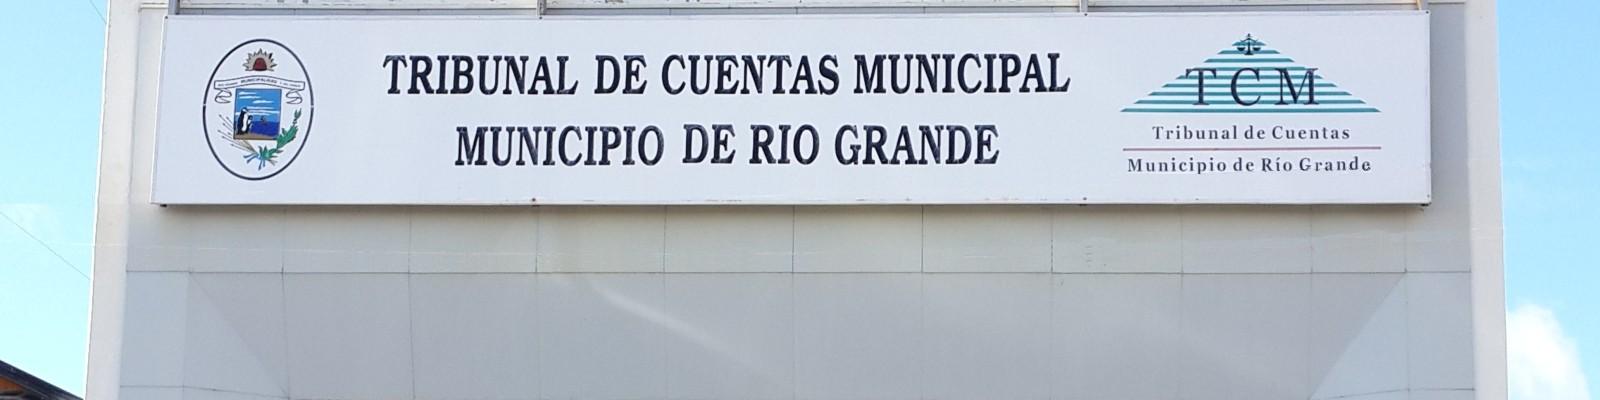 Tribunal de Cuentas Municipal – Municipio de Rio Grande